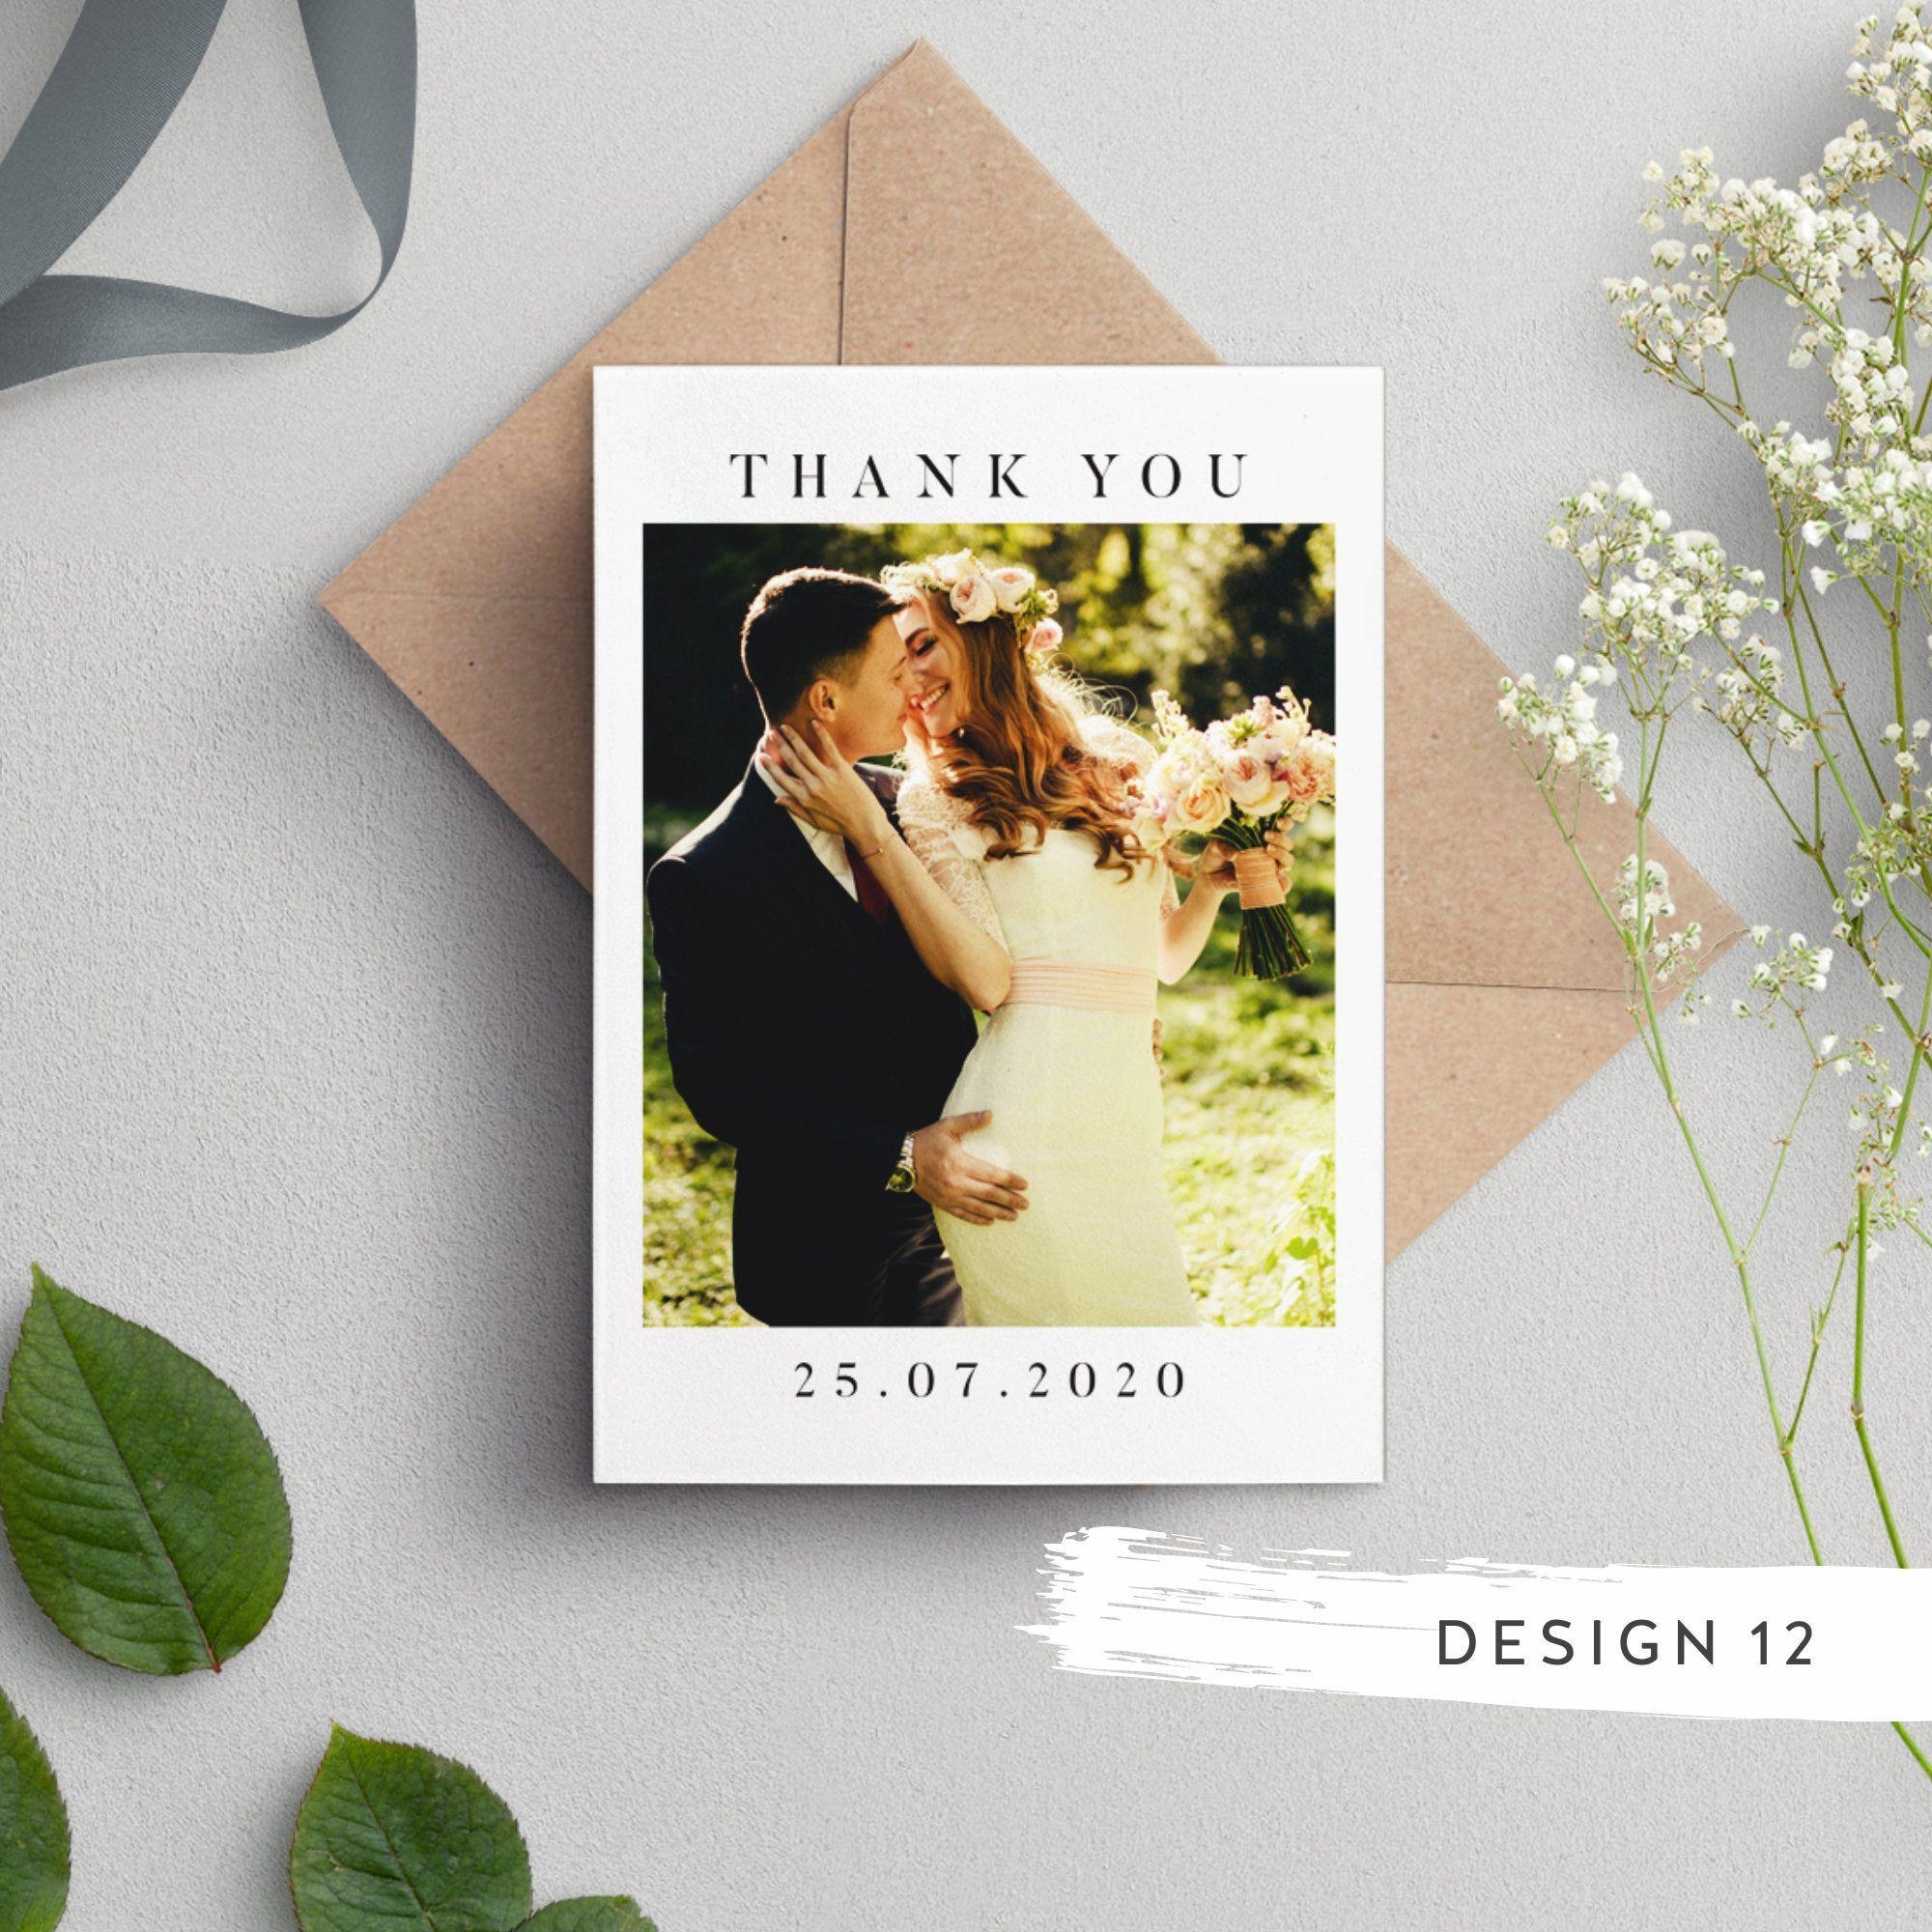 Wedding Thank You Cards With Photo, Thankyou Cards, Photo Thank You Card, Photo Card, Thankyou Cards Wedding, Photo Thank You Card, #087#card #cards #photo #thankyou #wedding